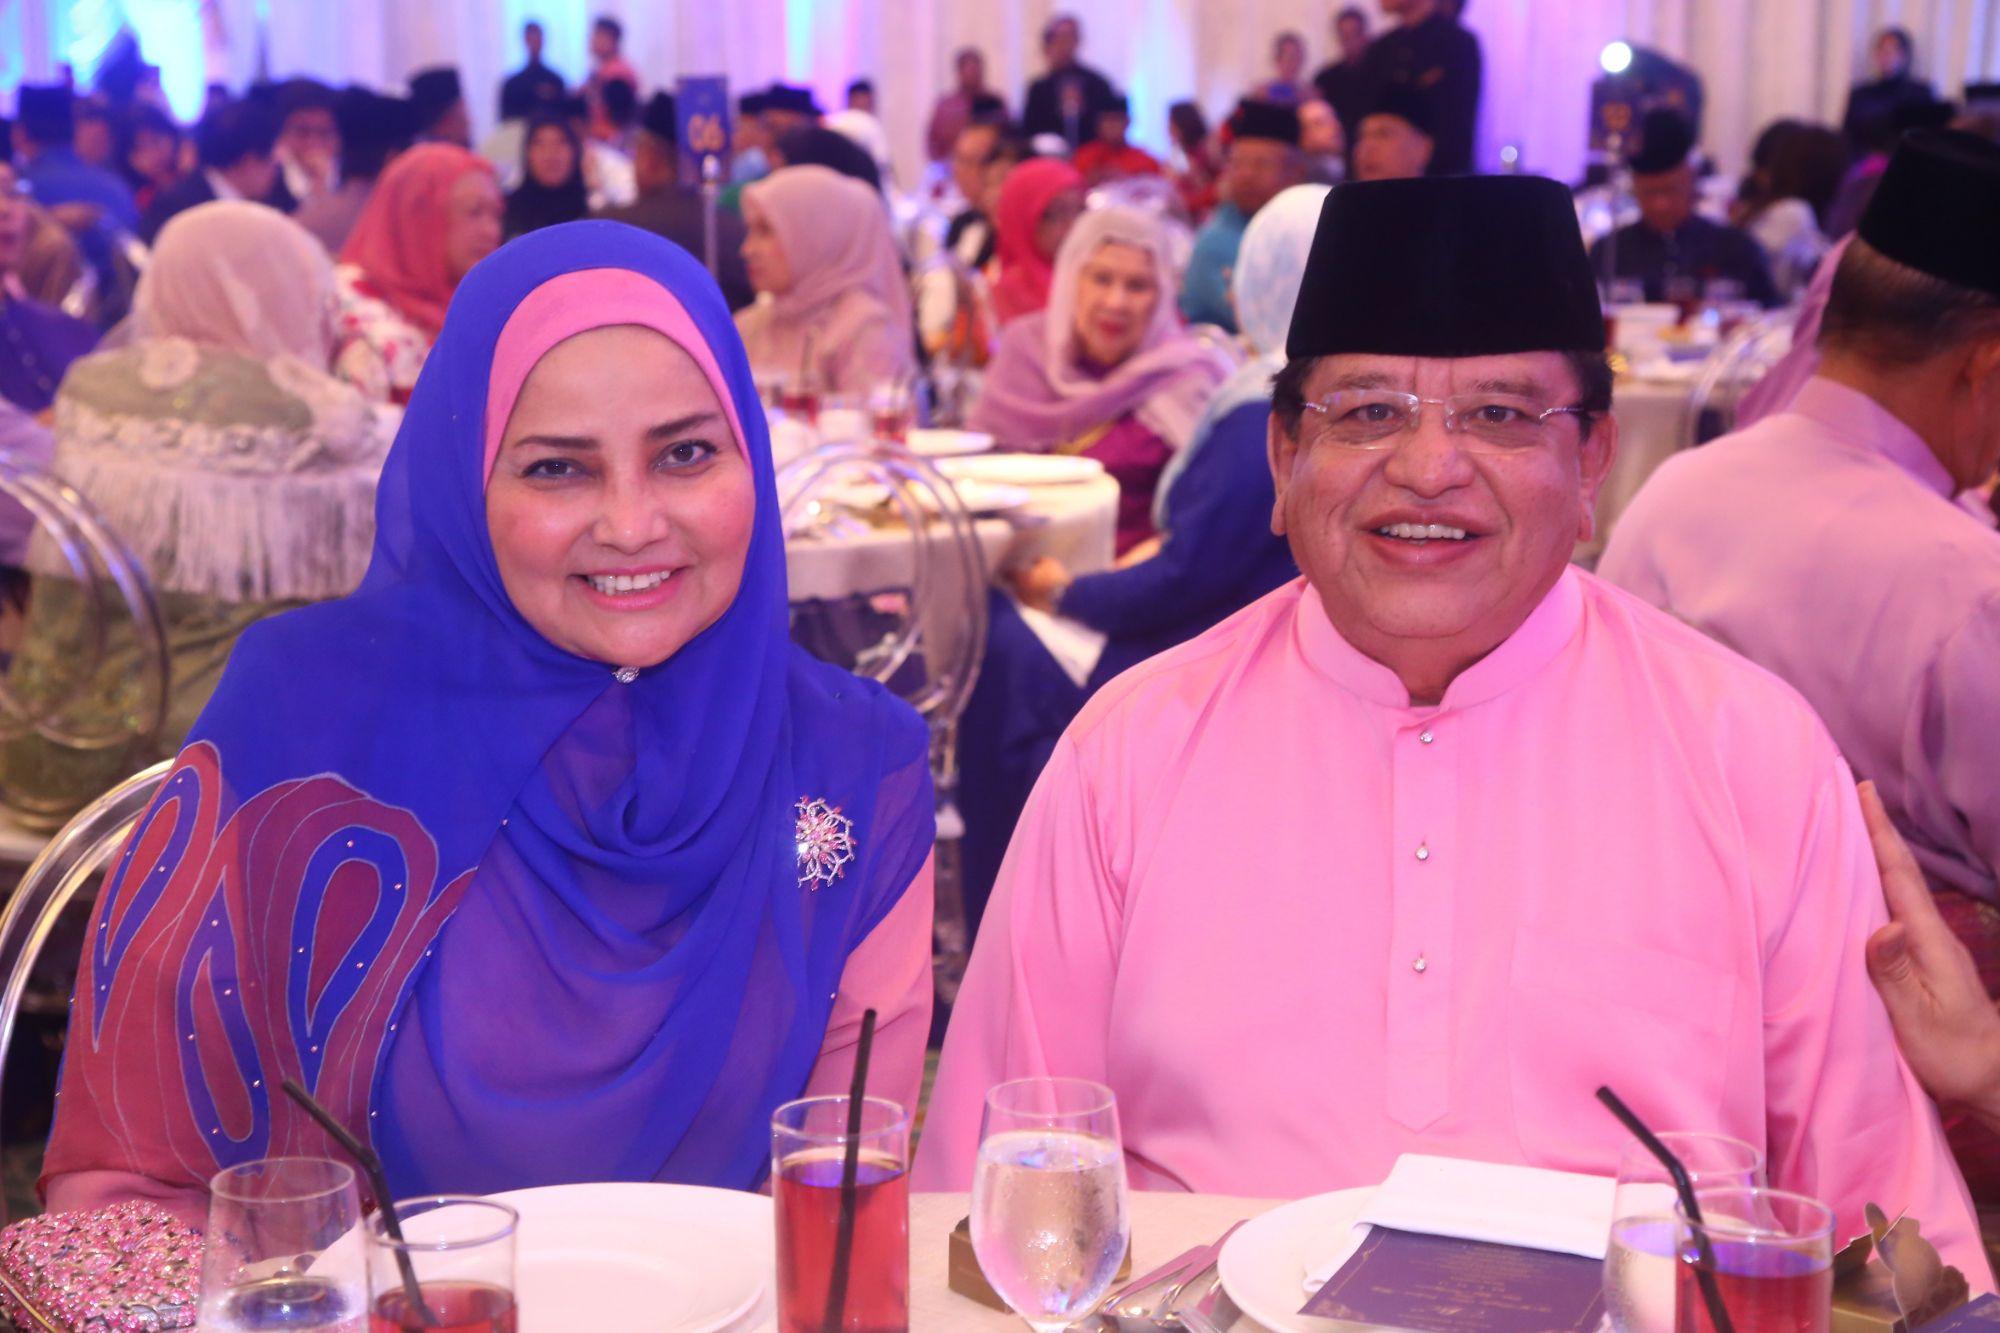 Datin Seri Utama Anggraini Sentiyaki and Datuk Seri Utama Tengku Adnan bin Tengku Mansor